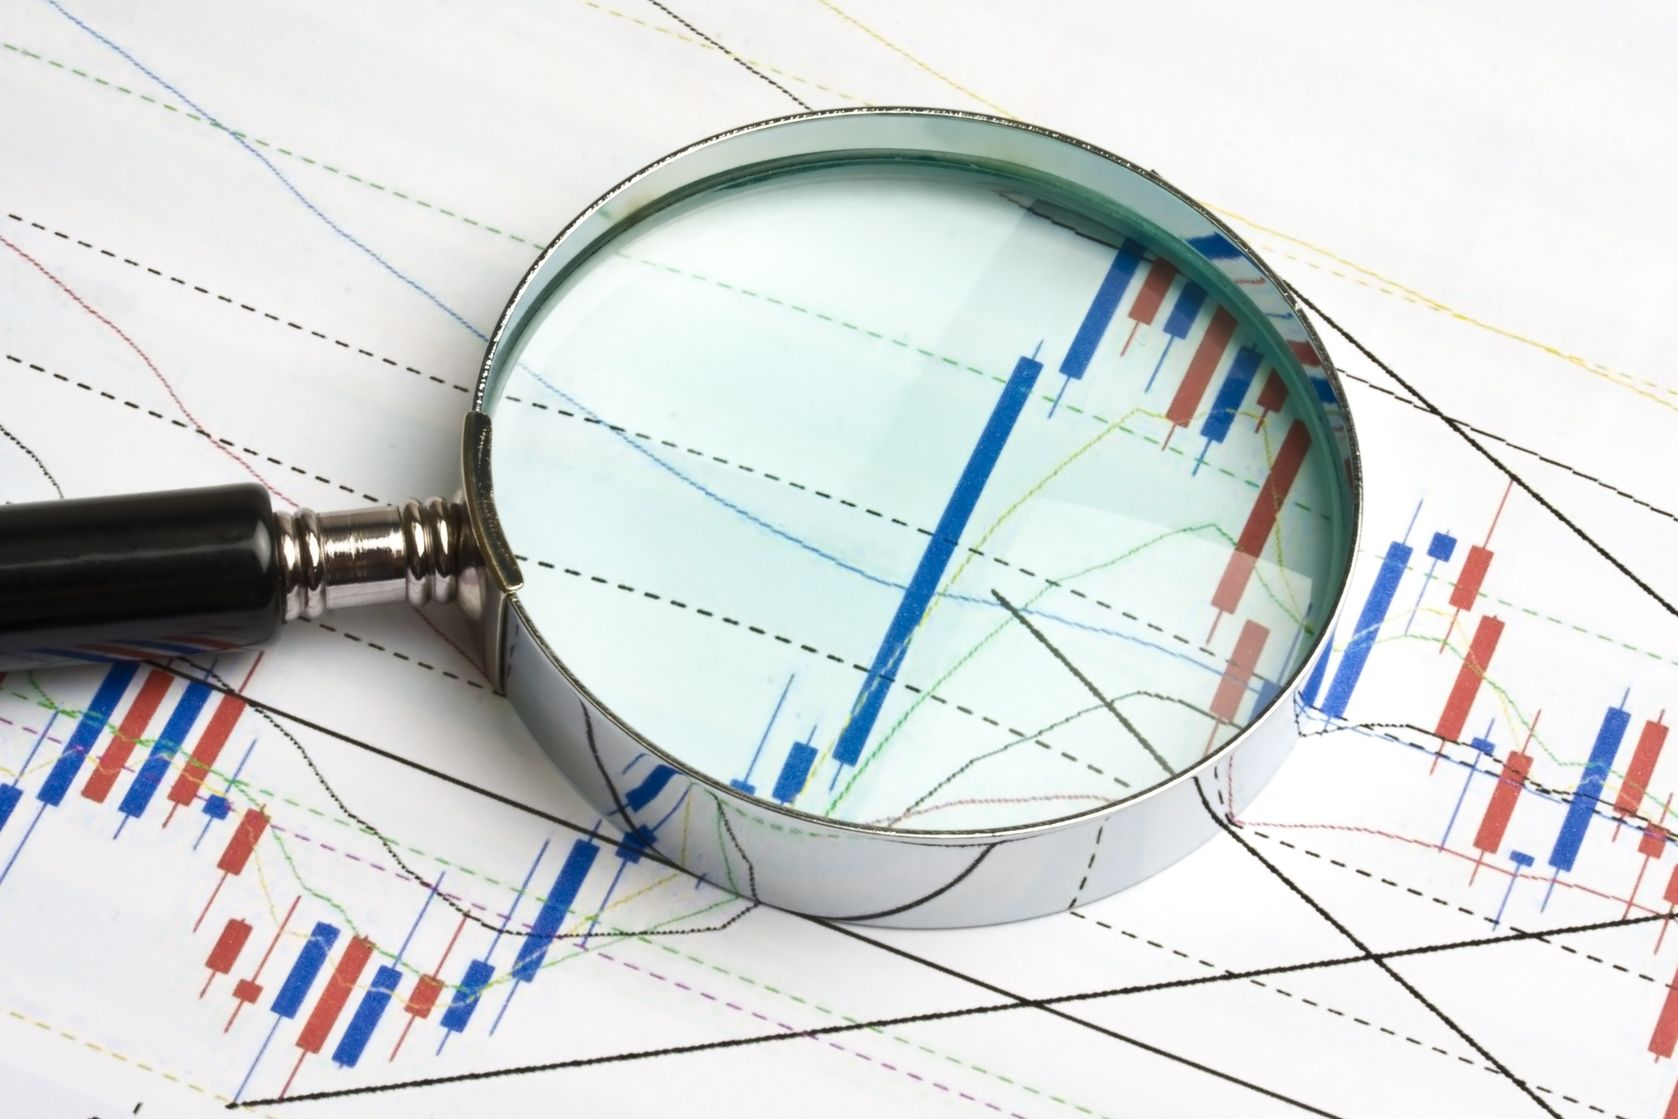 Etf trend trading system